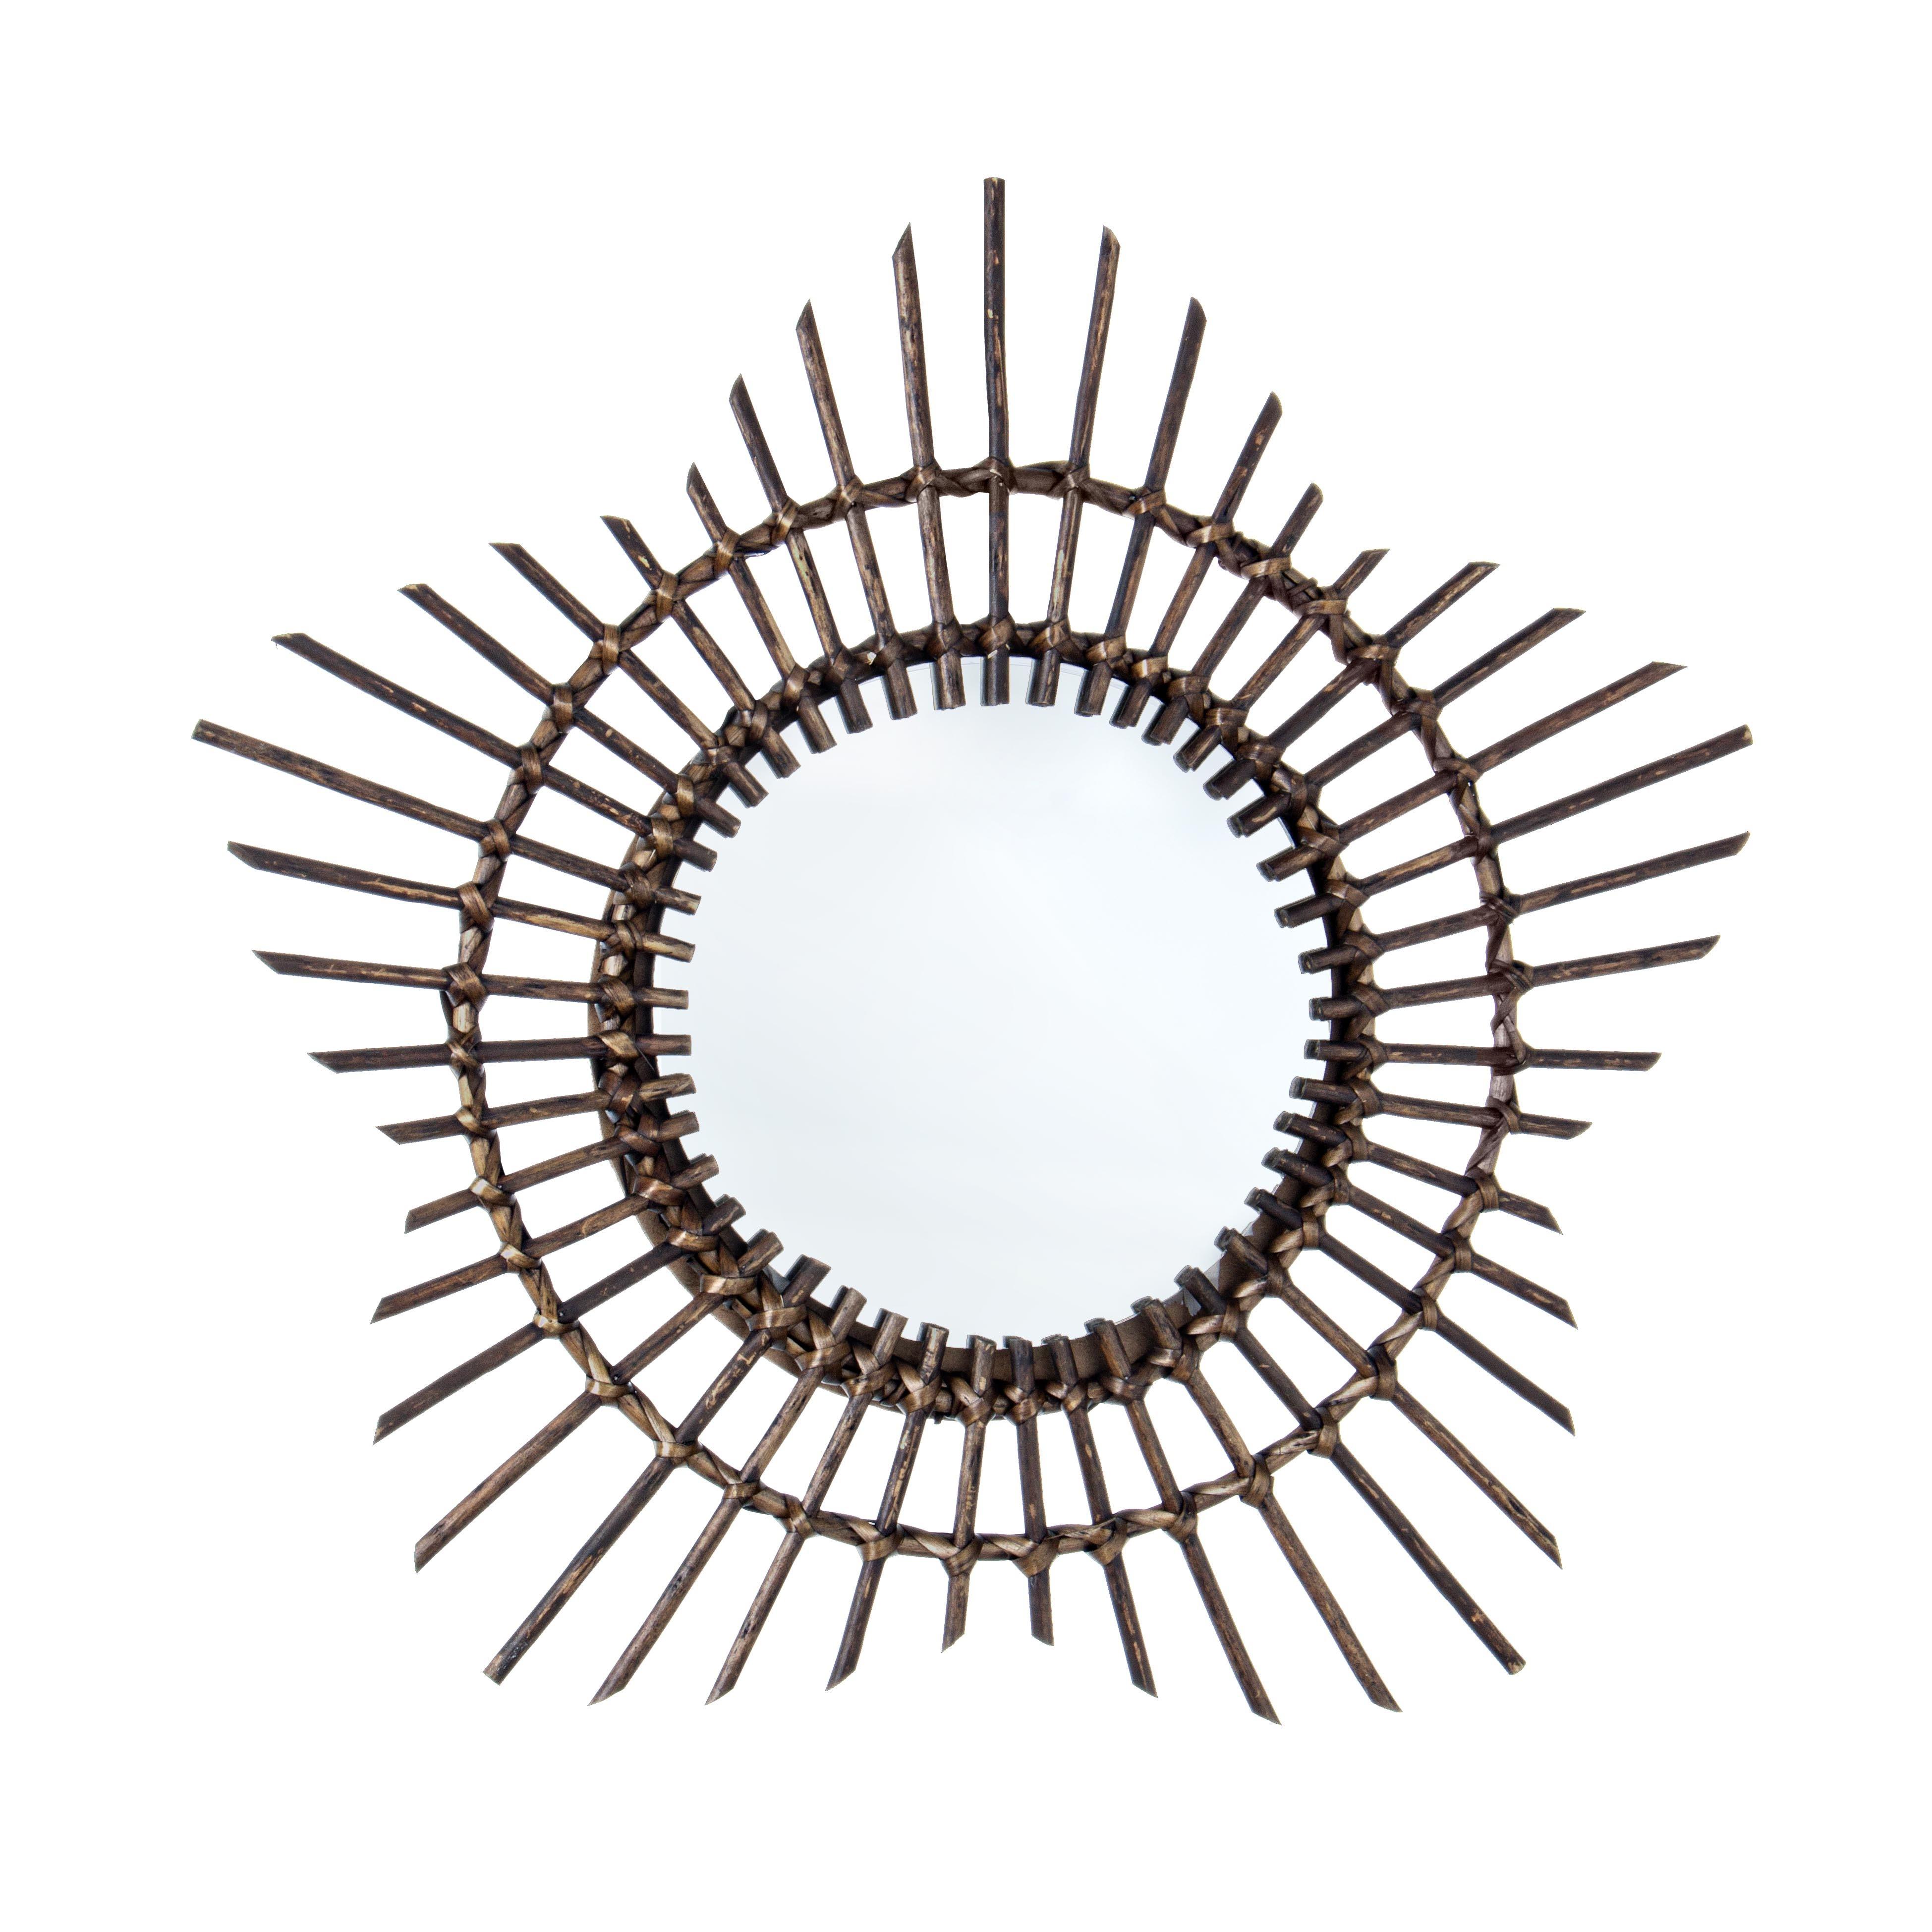 Oglinda decorativa din lemn Gibson Round Maro inchis, Ø55 cm imagine